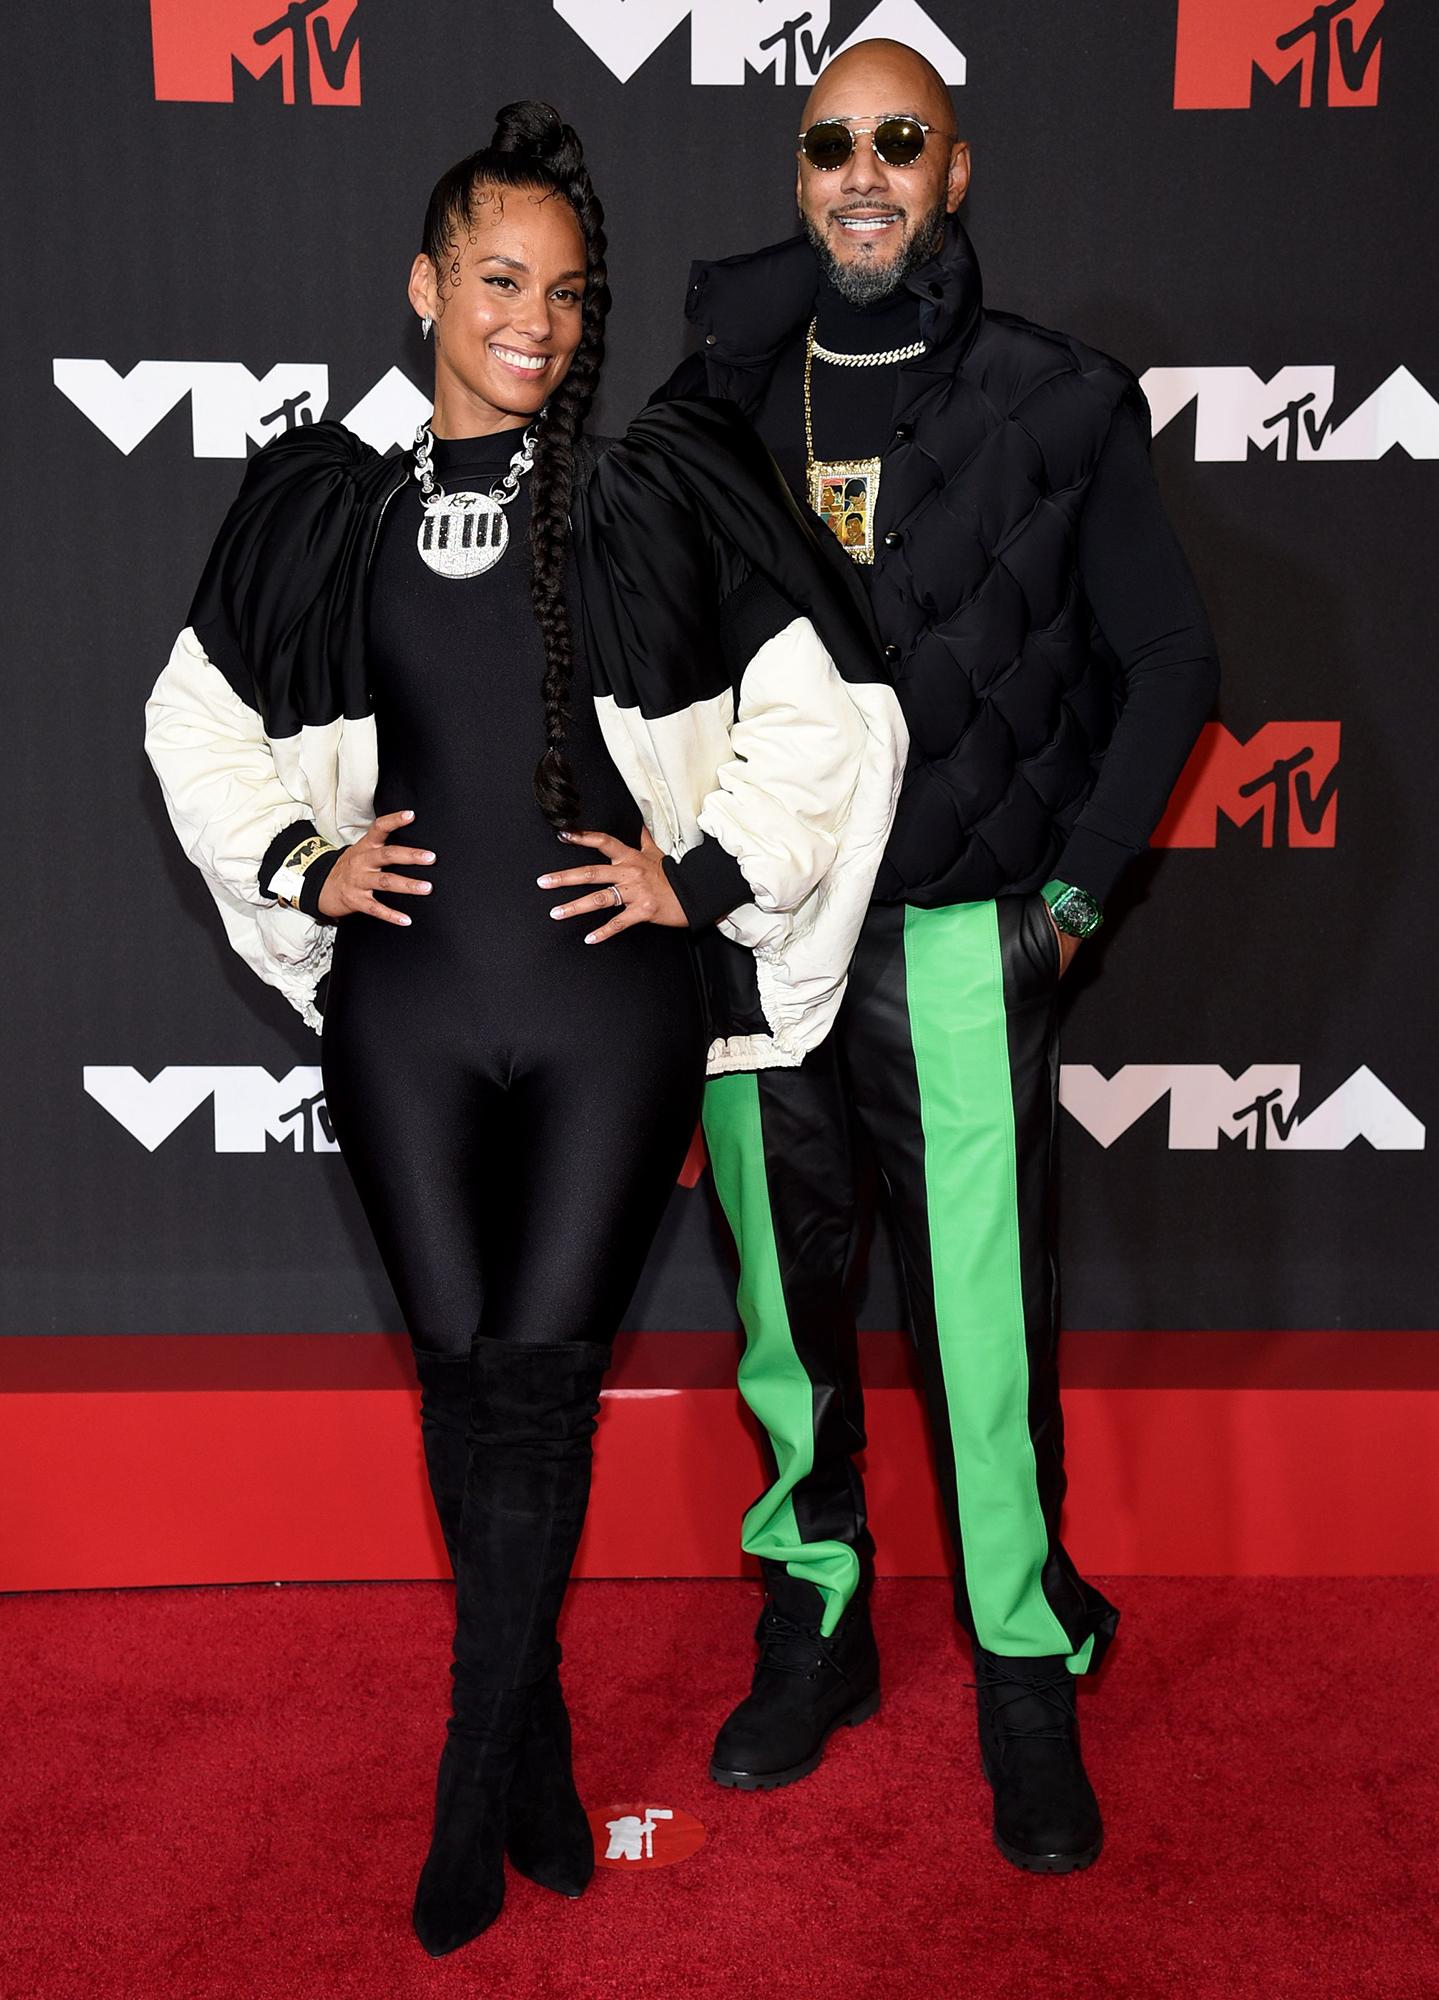 Alicia Keys and Swizz Beatz arrives at the 2021 MTV Video Music Awards